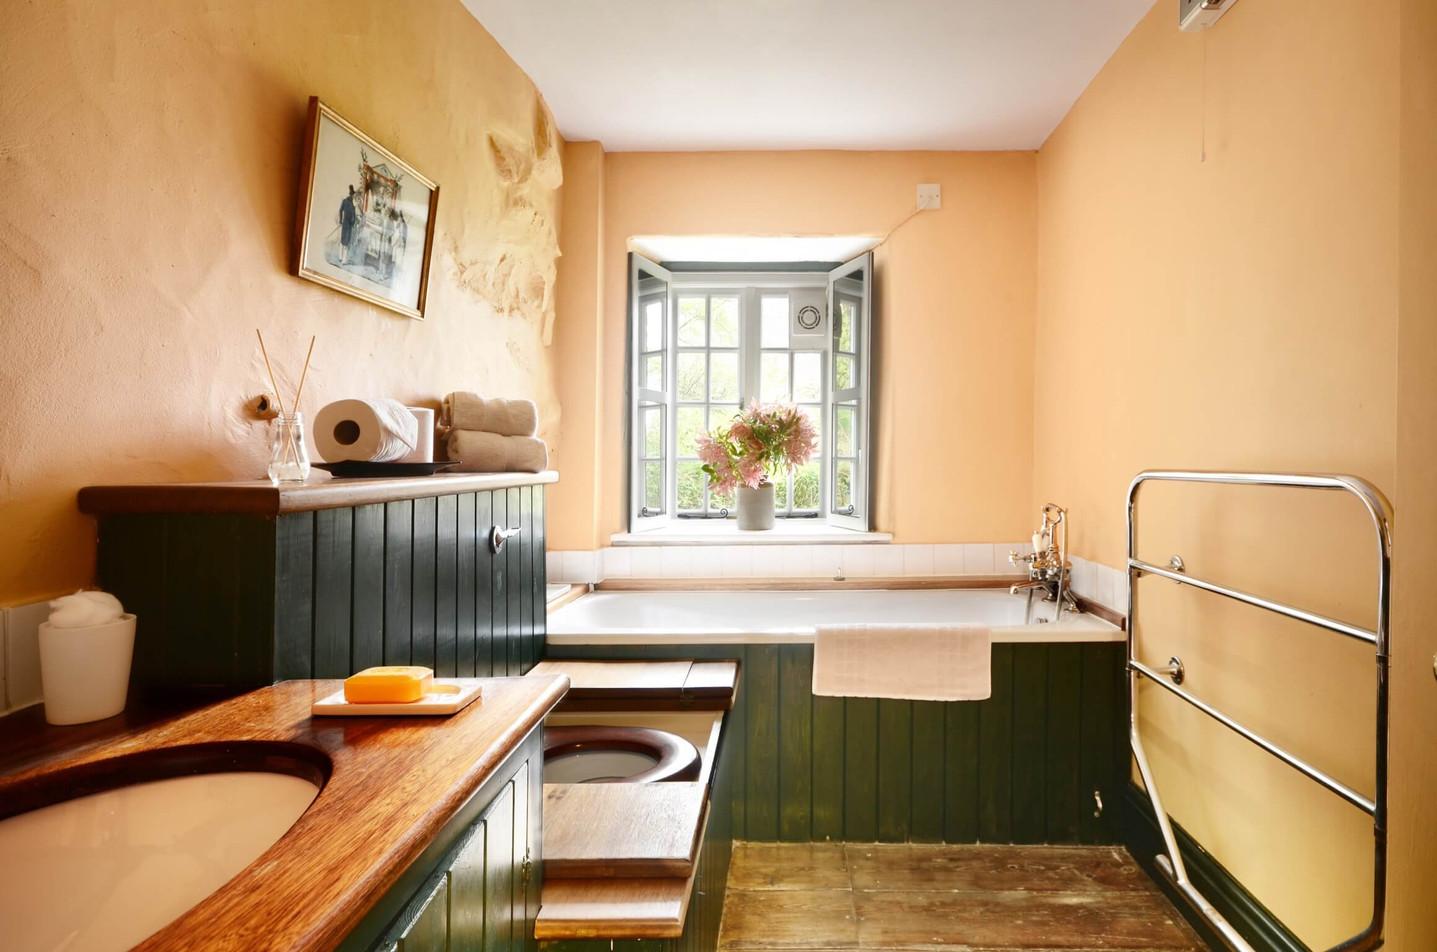 Mountain_Cottage_Bathroom_1.jpg